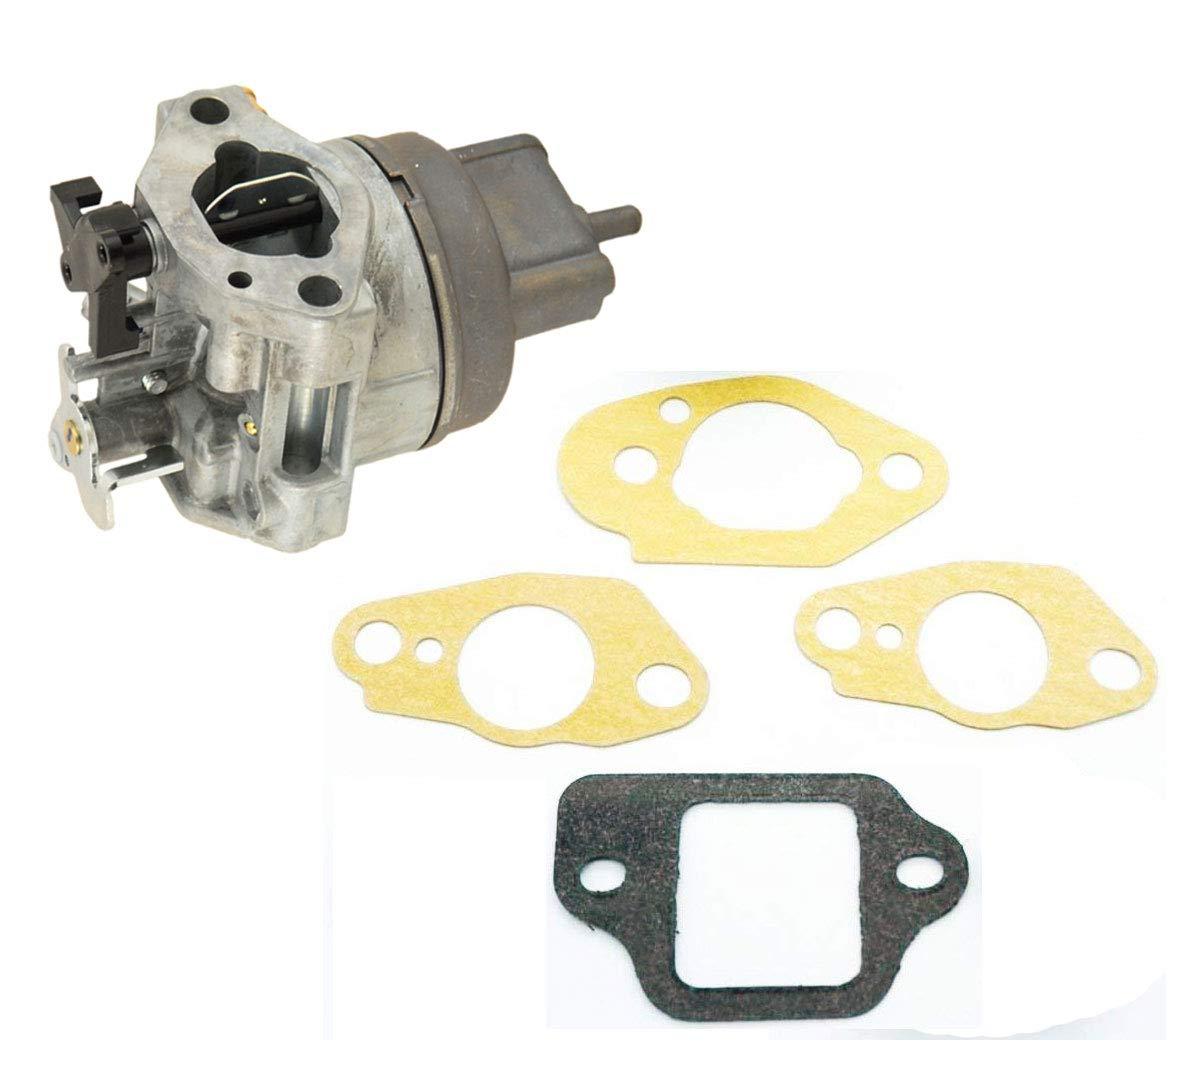 Honda 16100-Z0J-013 Lawn Mower Carburetor and Gaskets Kit